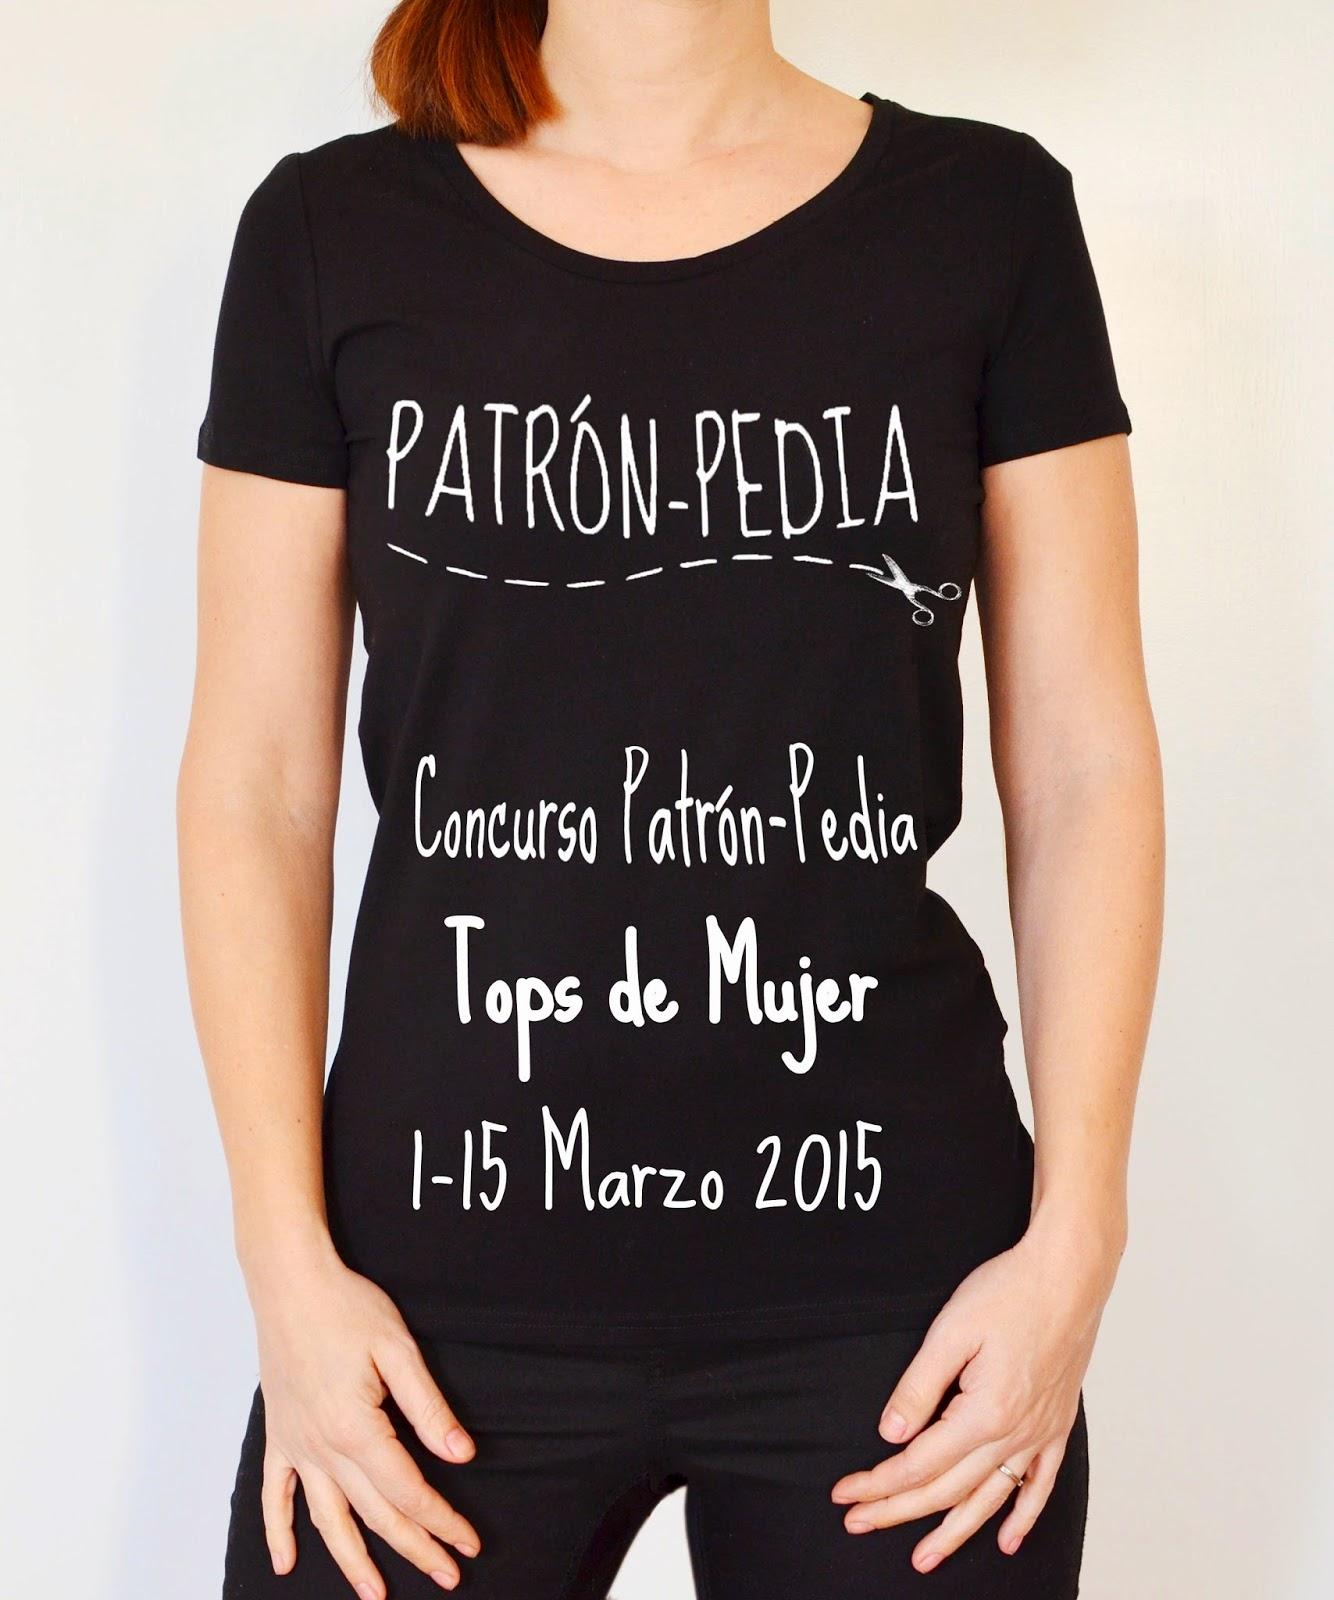 PATRÓN-PEDIA